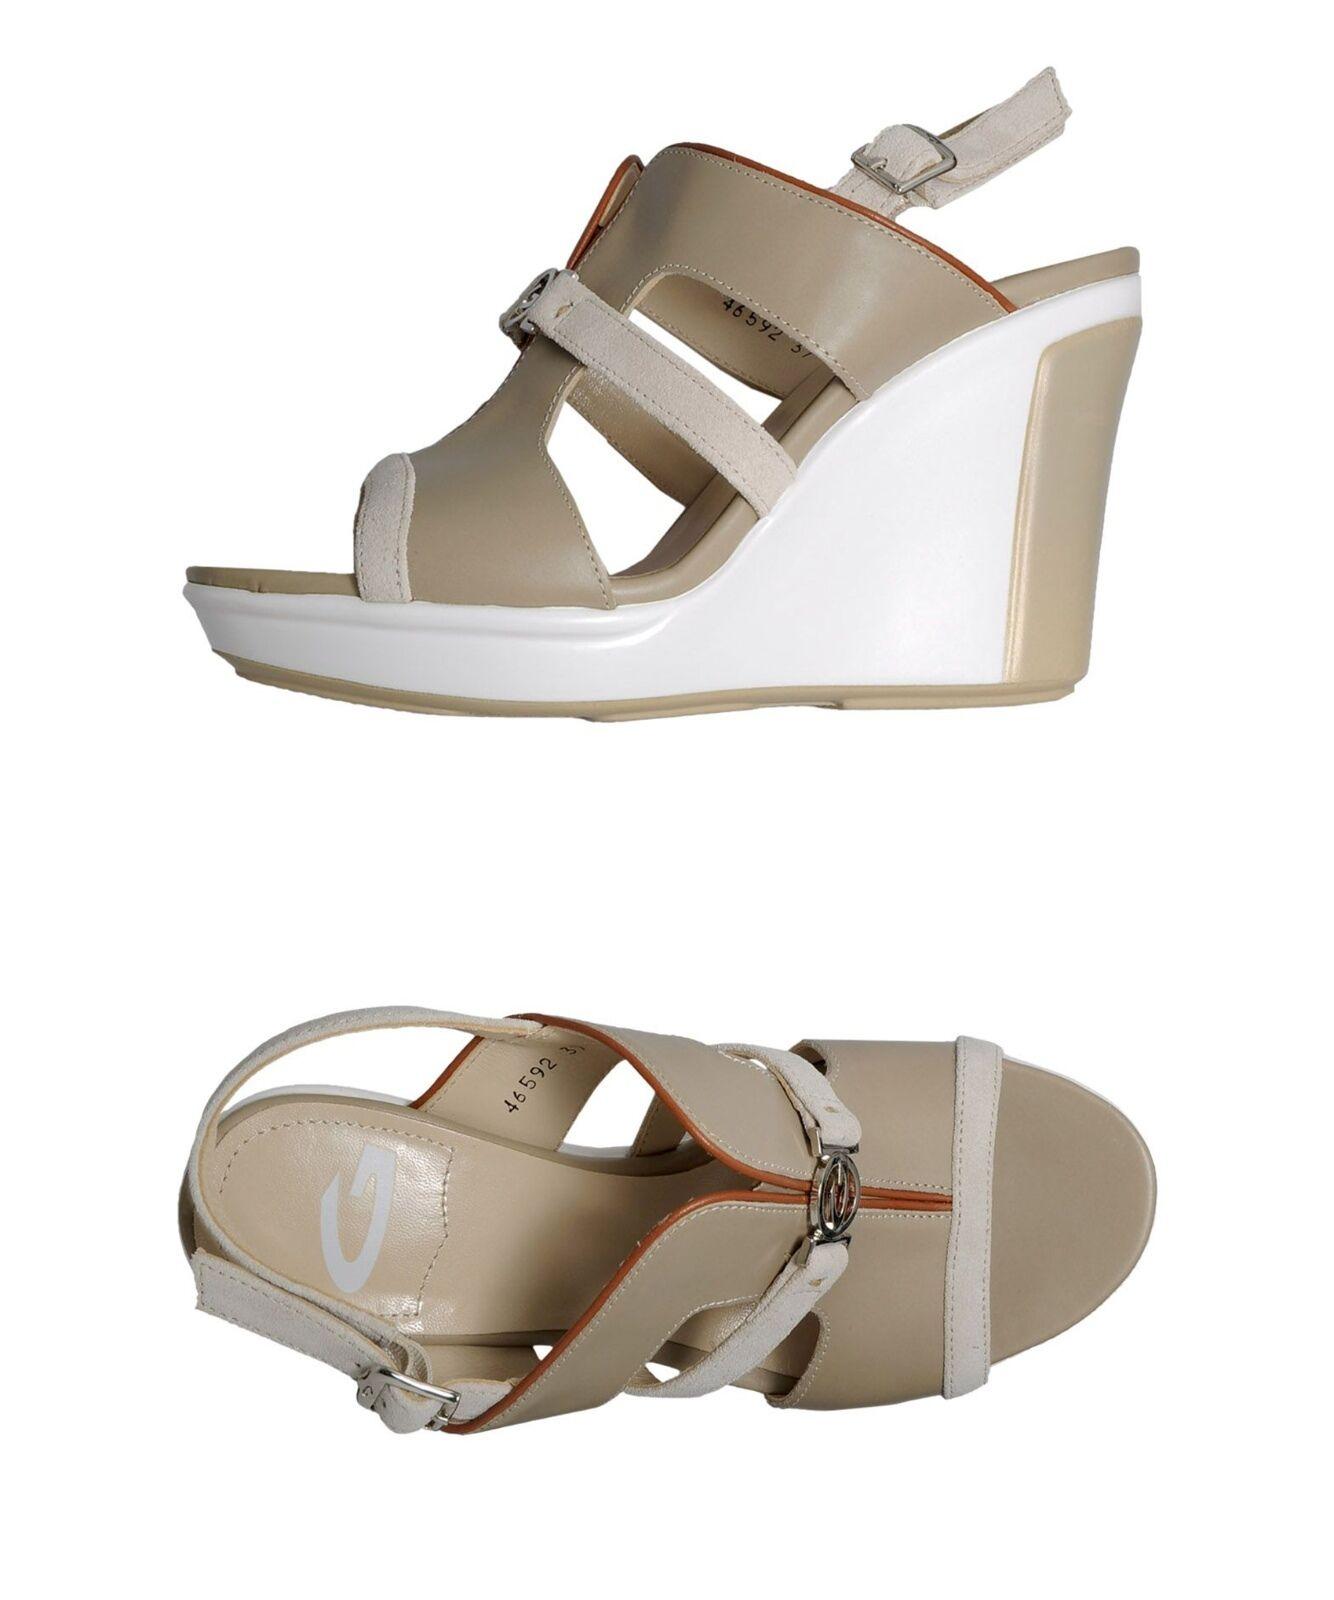 NEW Alberto Guardiani Italia Clio platform wedge leather sandals 8 B 38  295